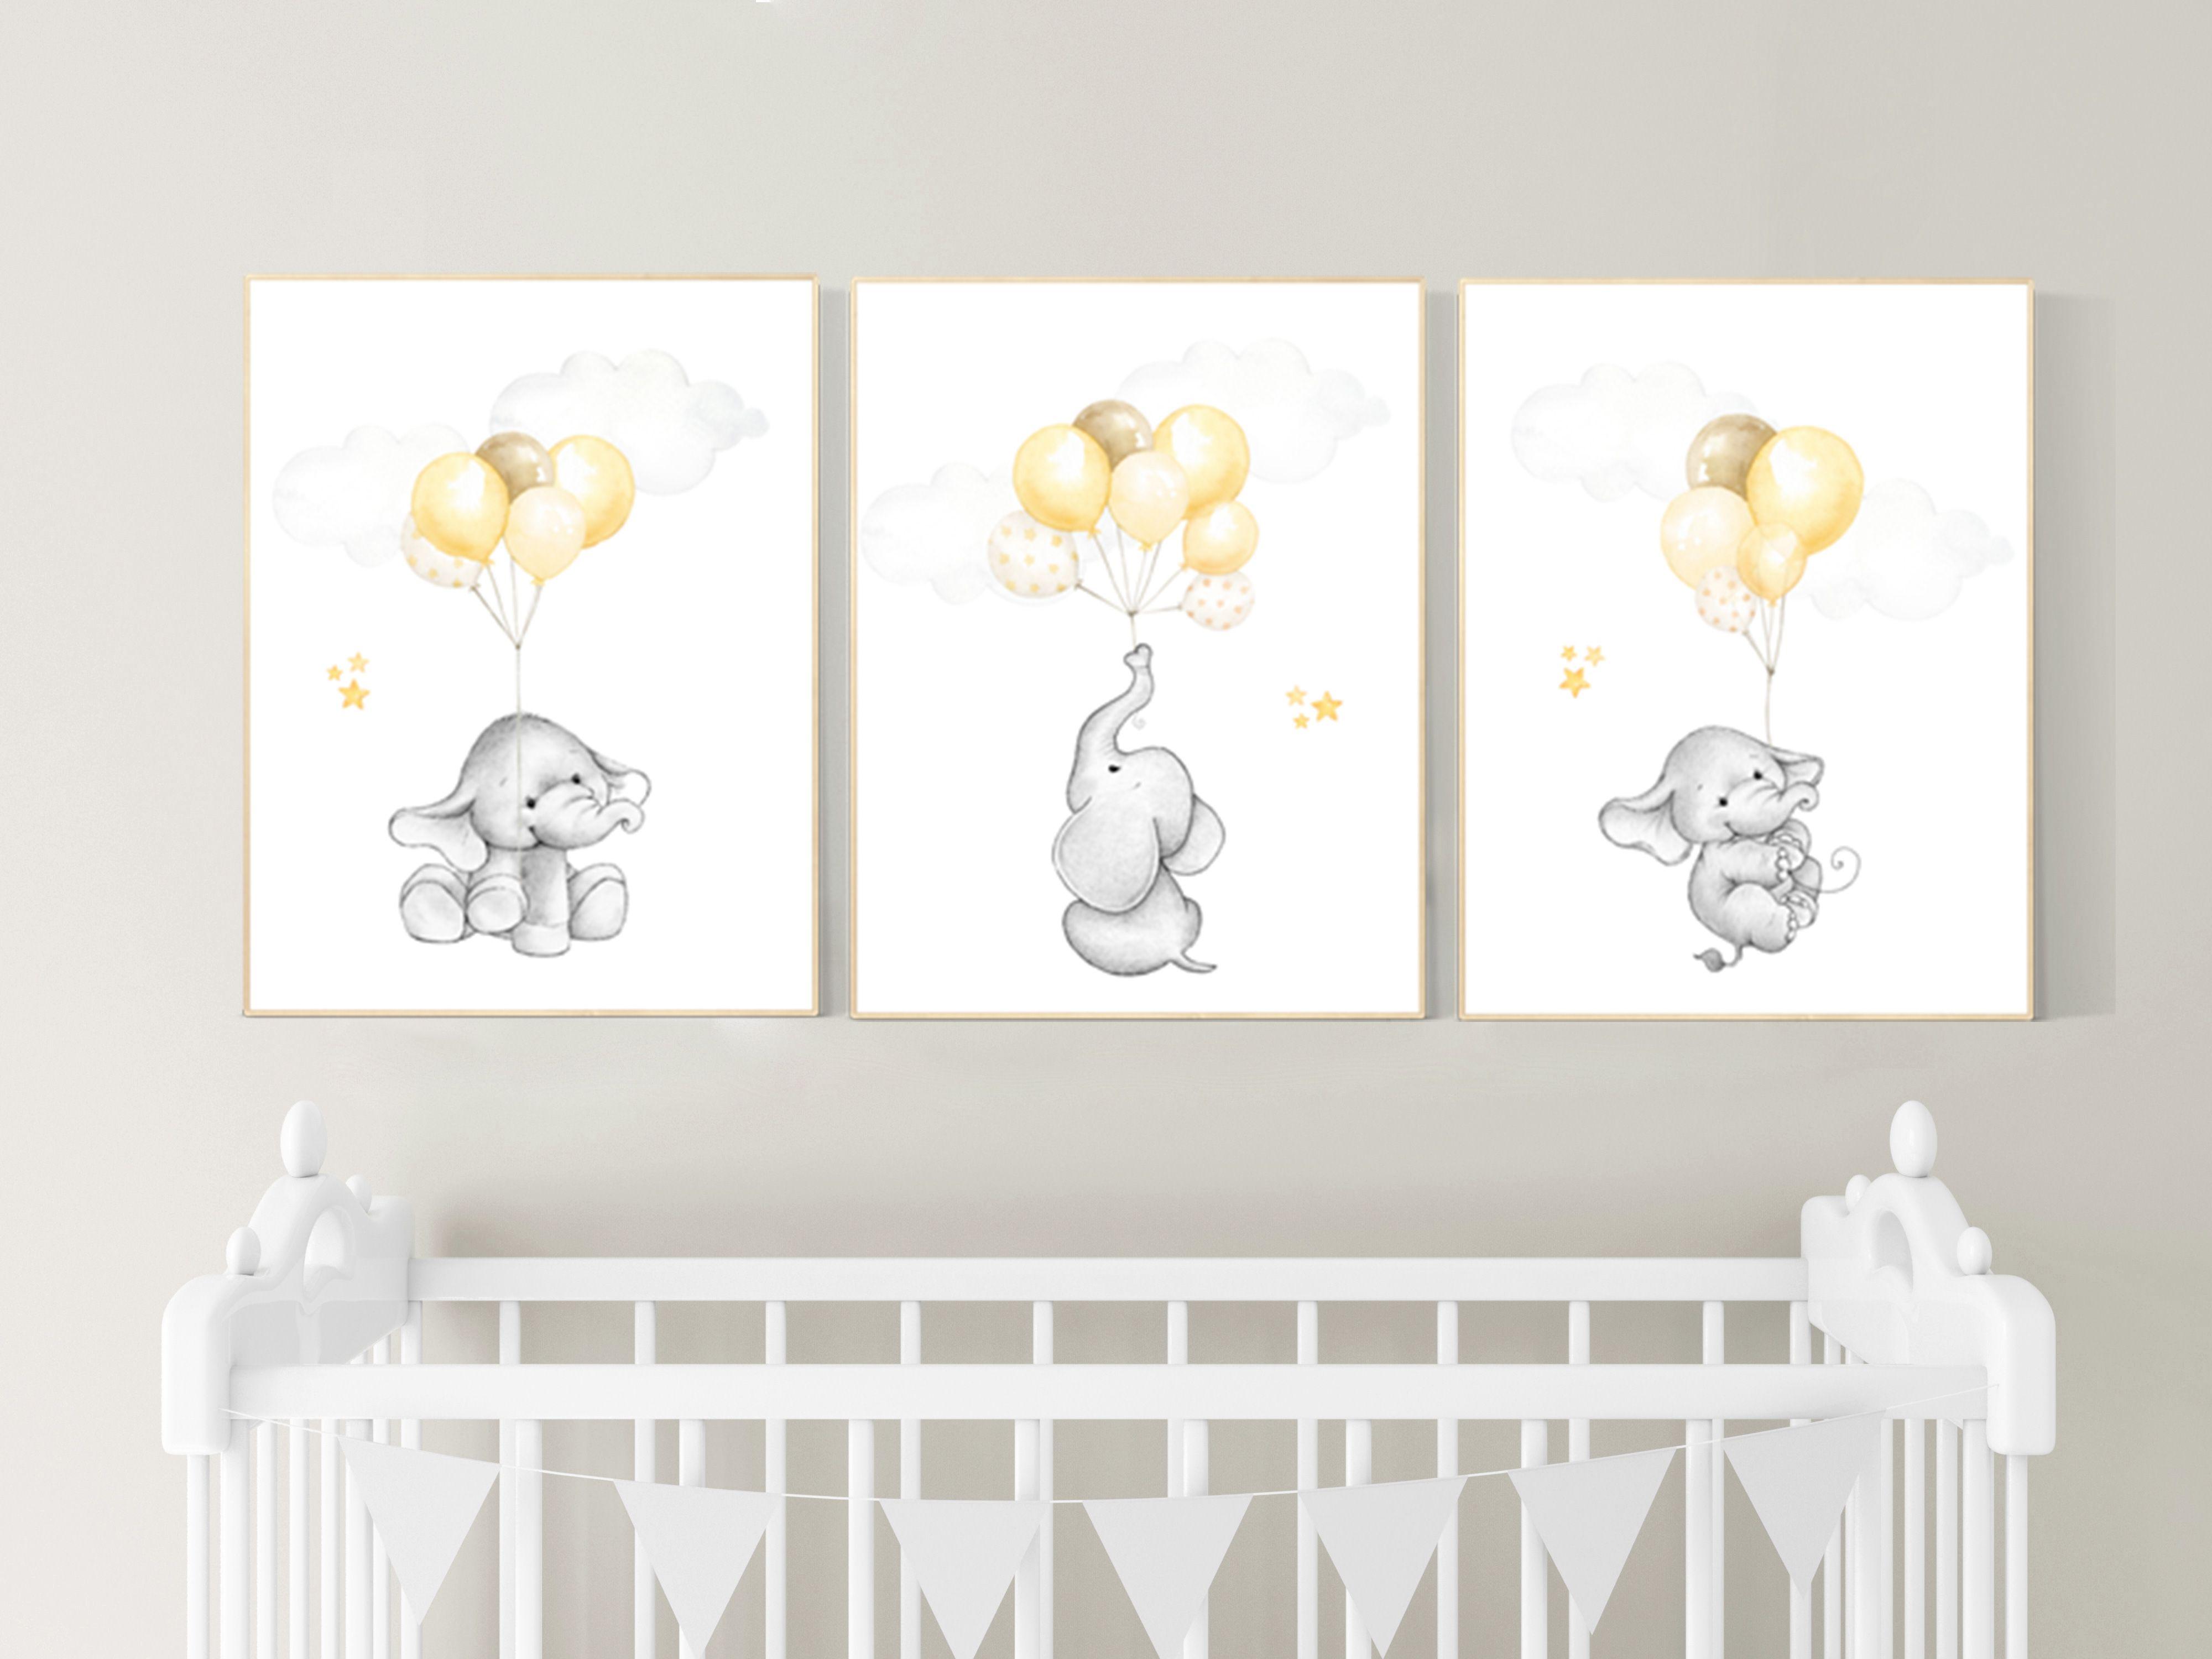 Gender Neutral Nursery Wall Art Yellow Gray Yellow Grey Neutral Nursery Decor Stars And Moon Nursery Prints Neutral Baby Room Wall Art Baby Room Wall Art Nursery Decor Neutral Baby Room